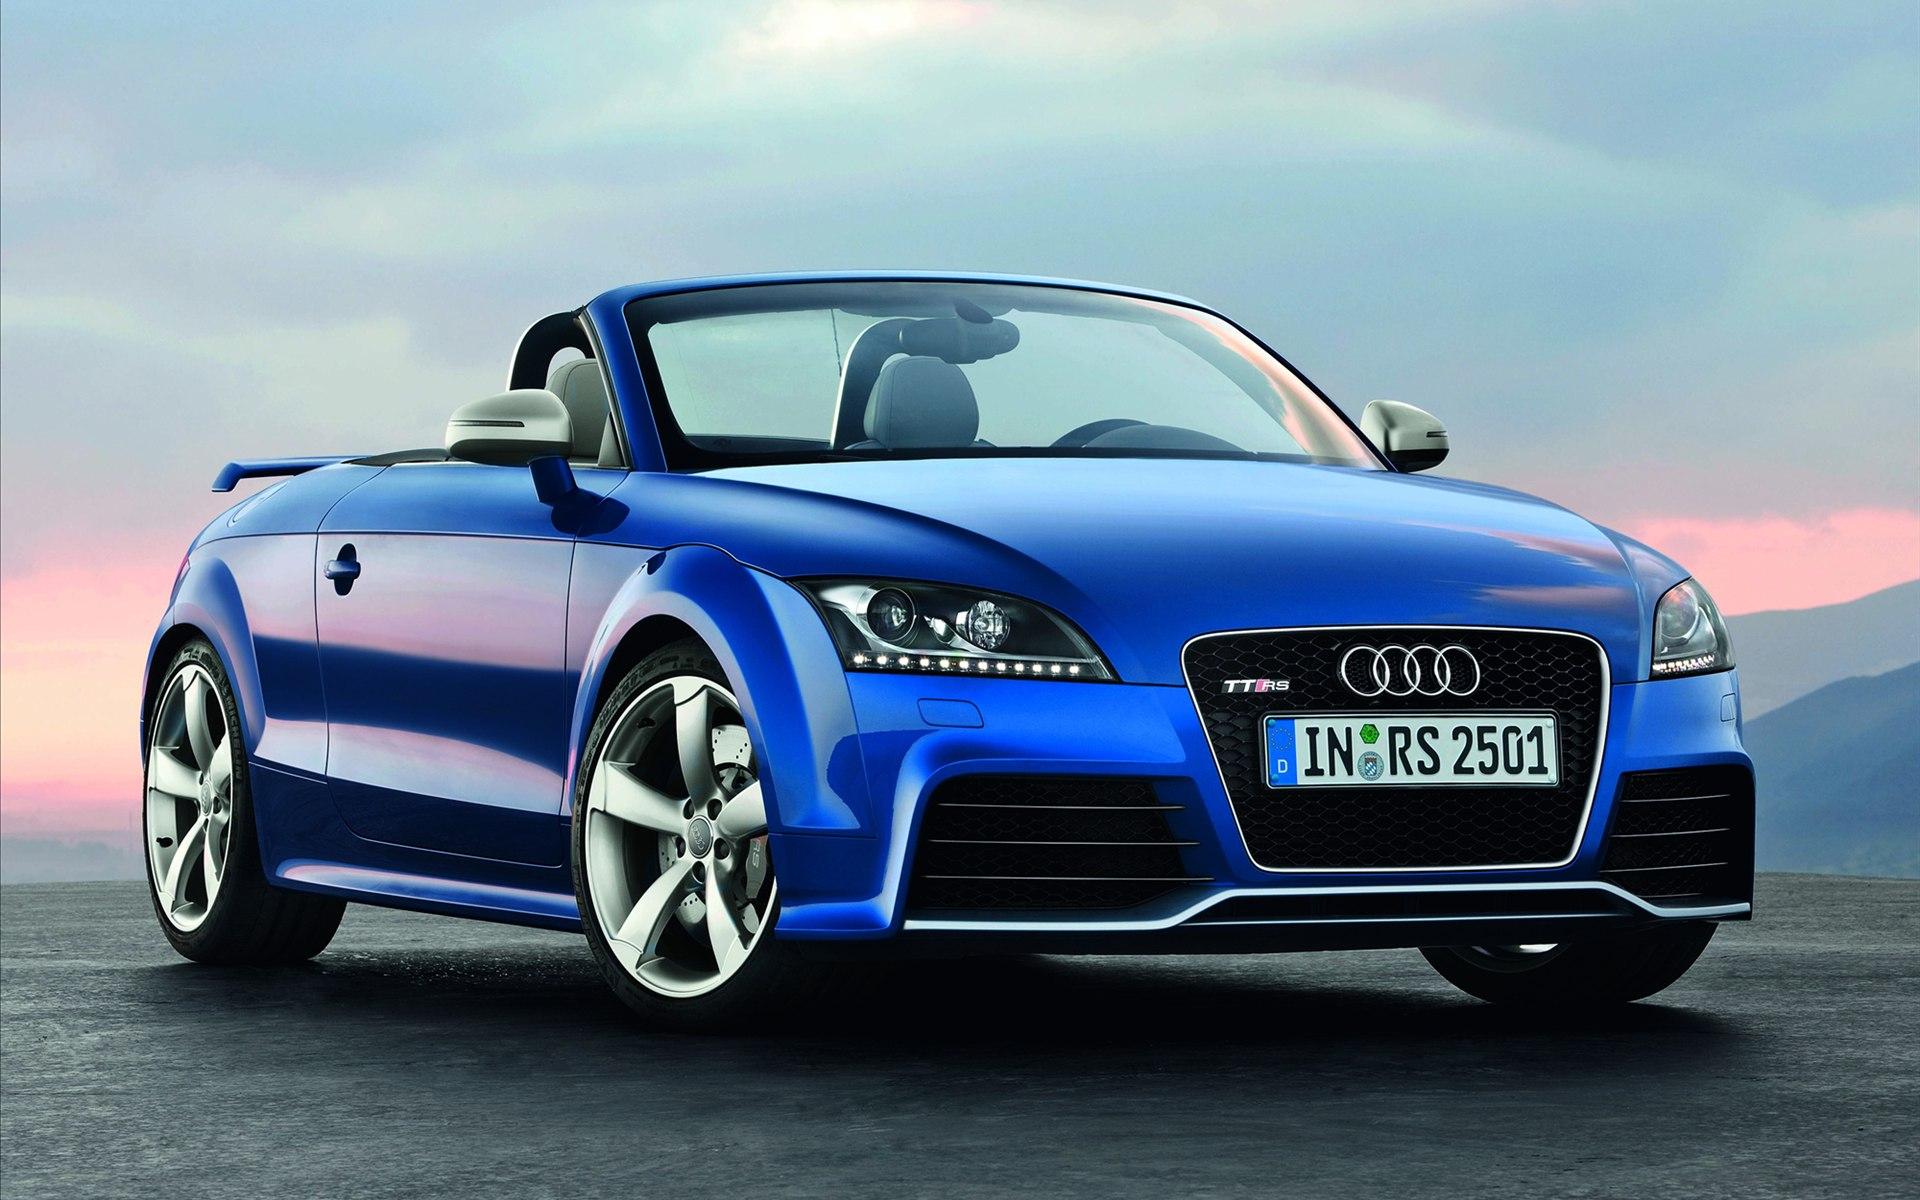 2012 Audi TT RS Wallpapers HD Wallpapers 1920x1200